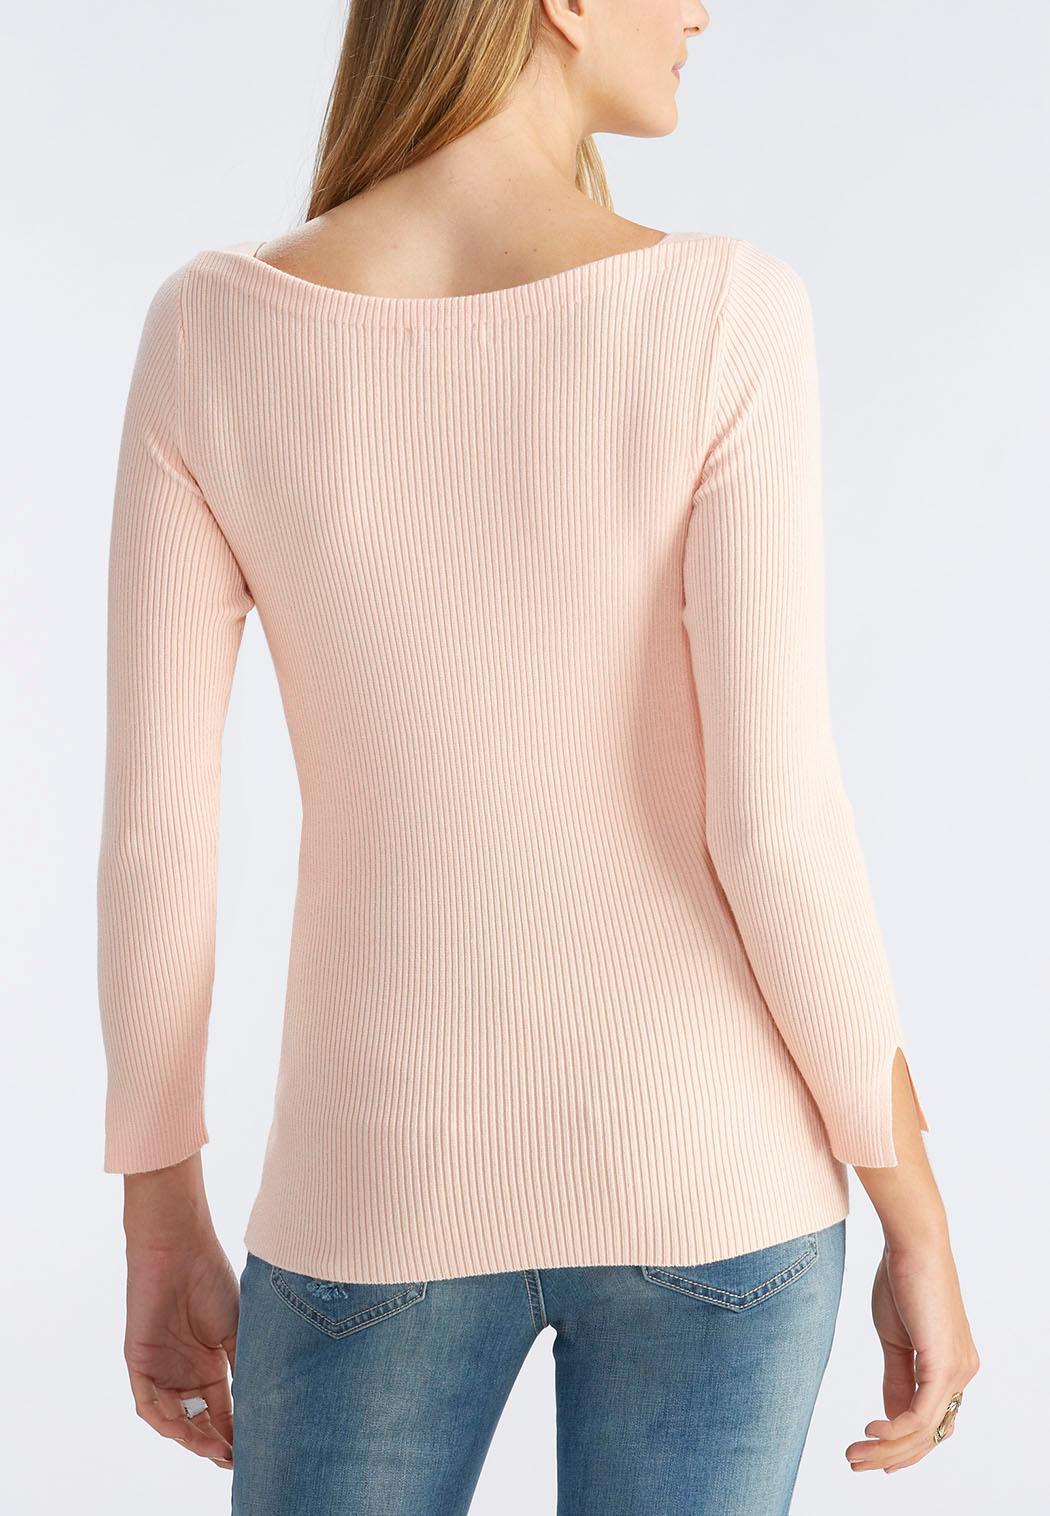 Cato Sweaters